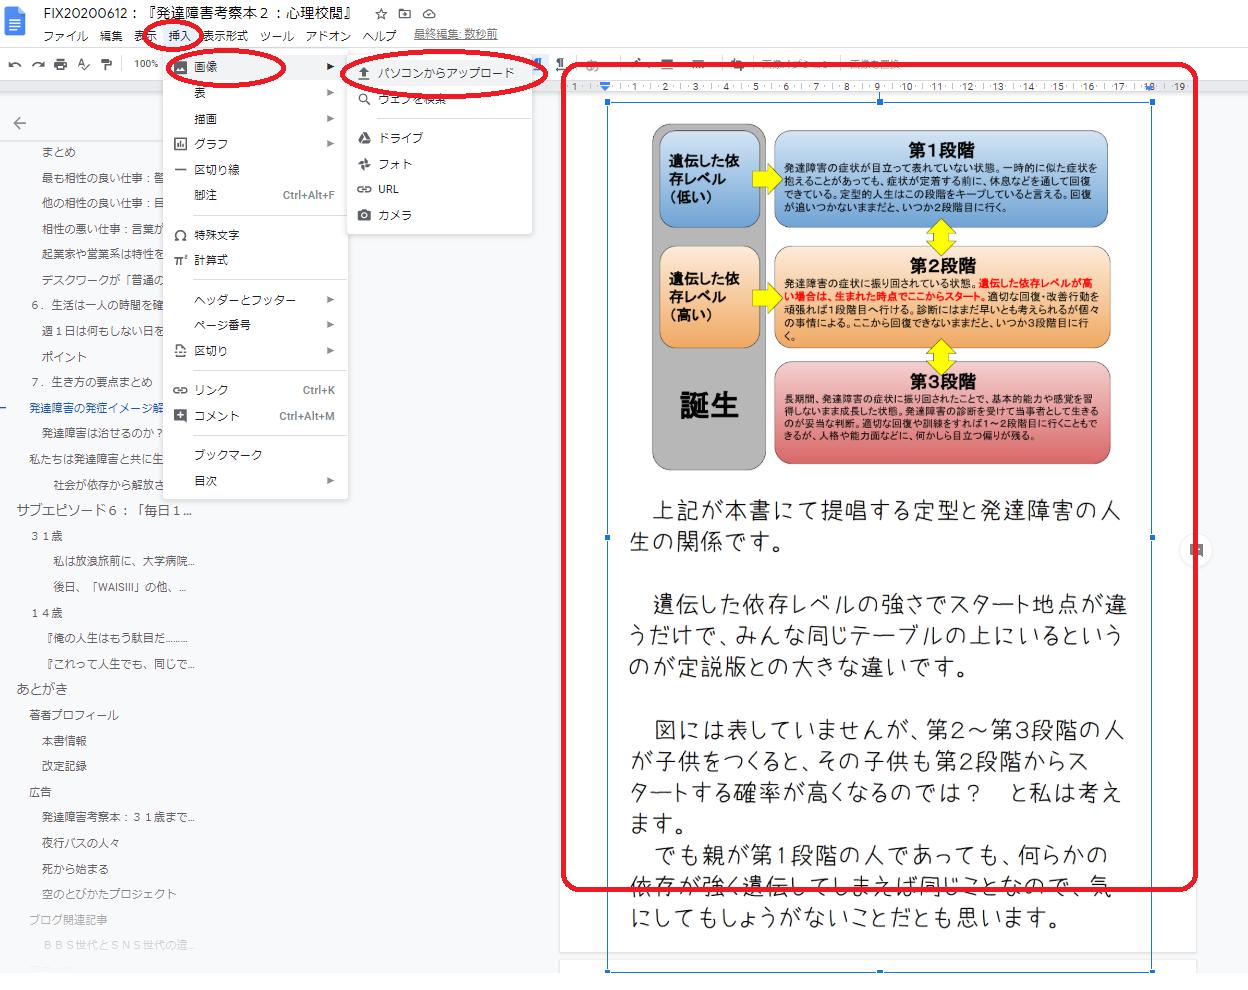 f:id:hyogokurumi:20200629133630p:plain